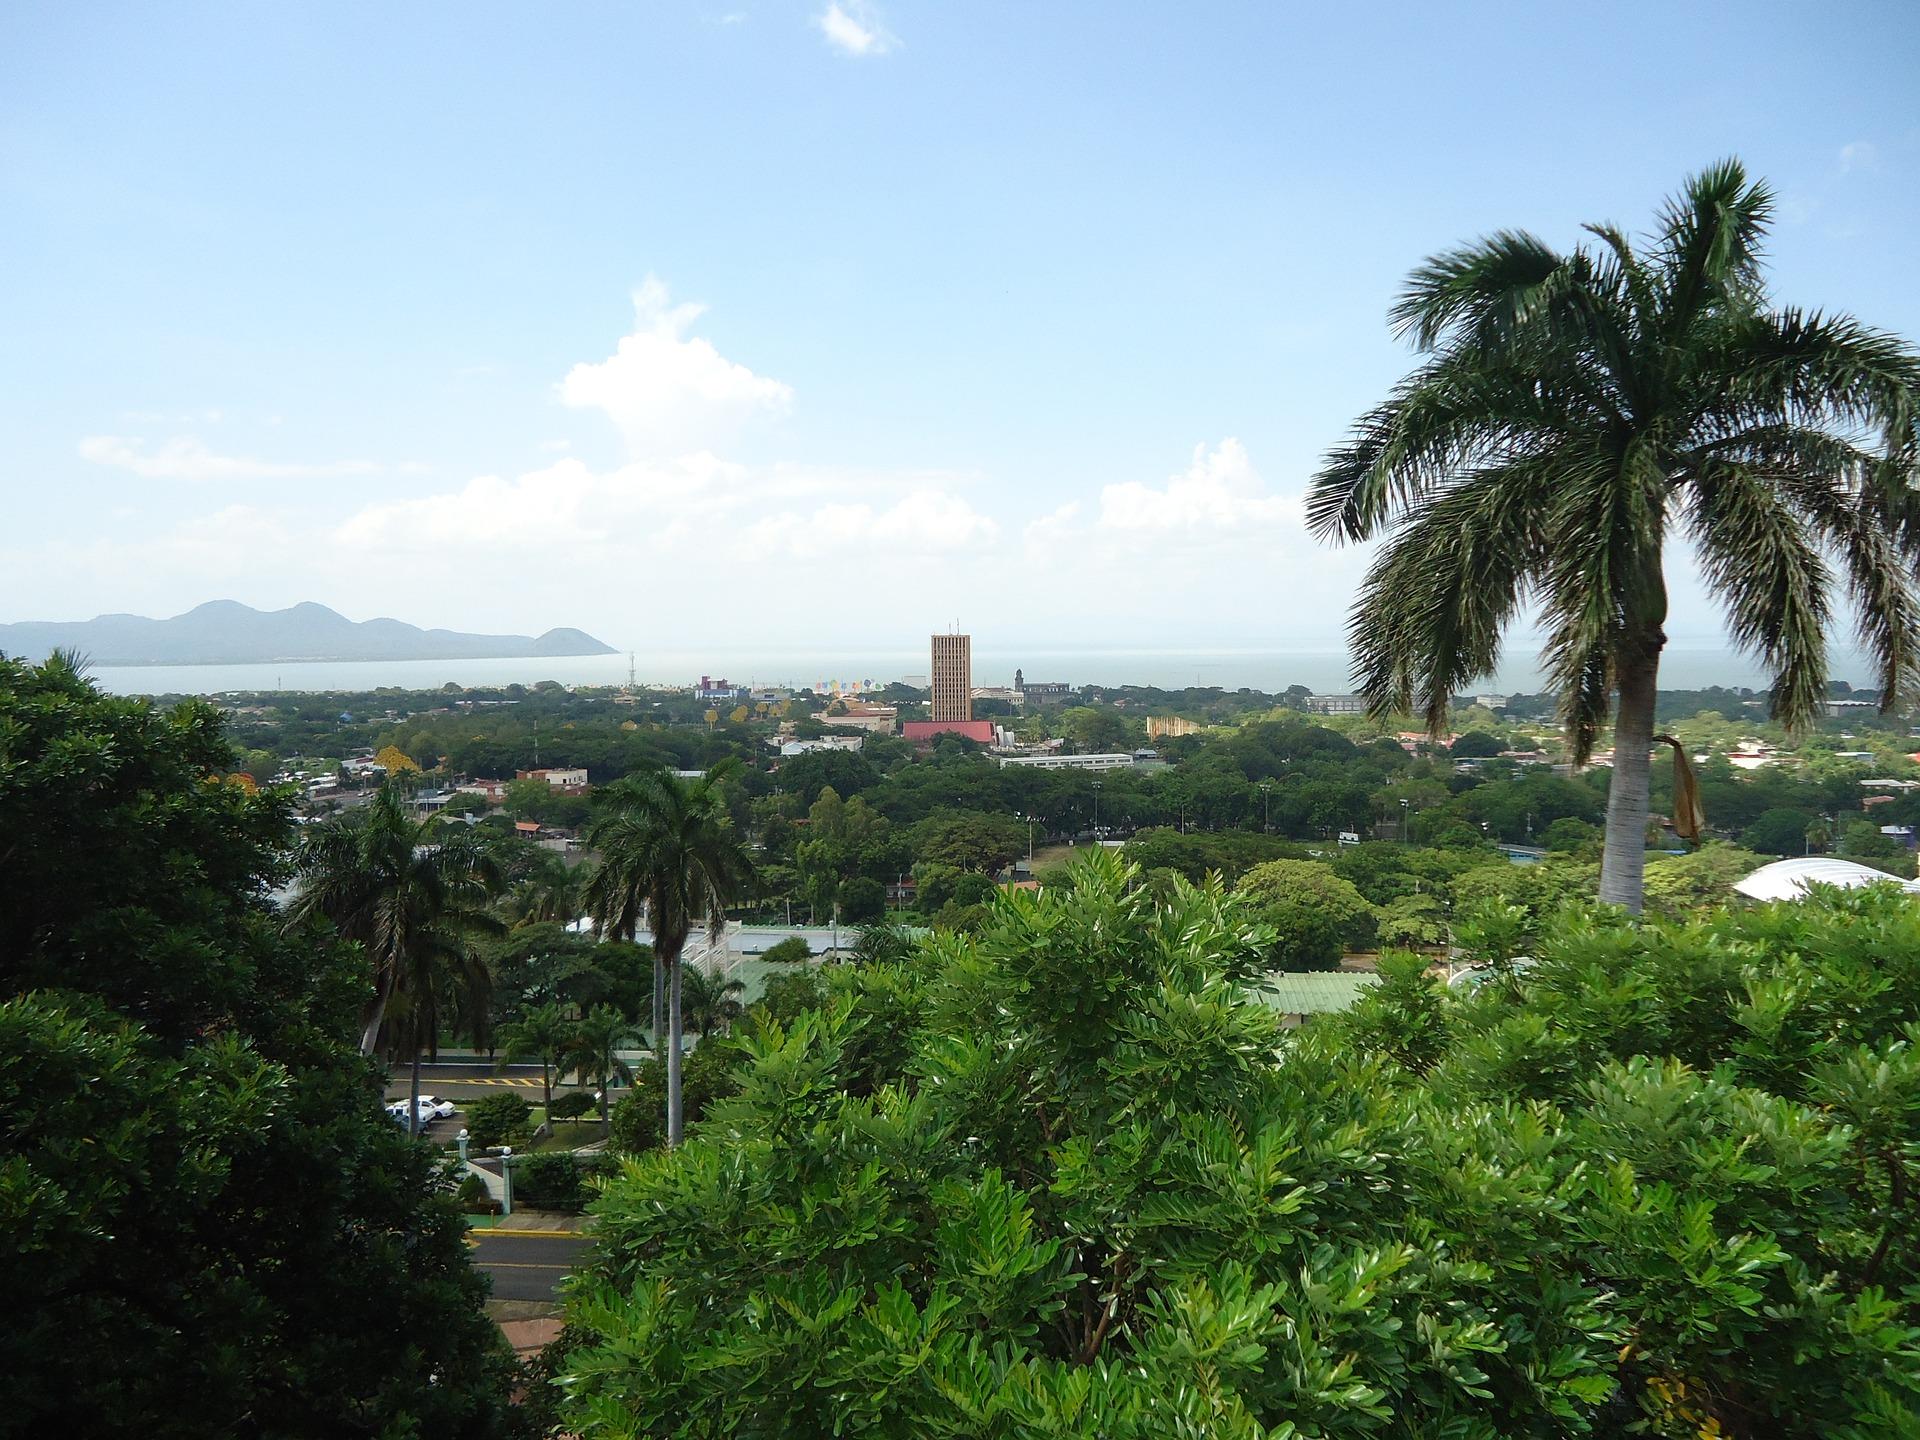 Obtain Nicaragua Passport